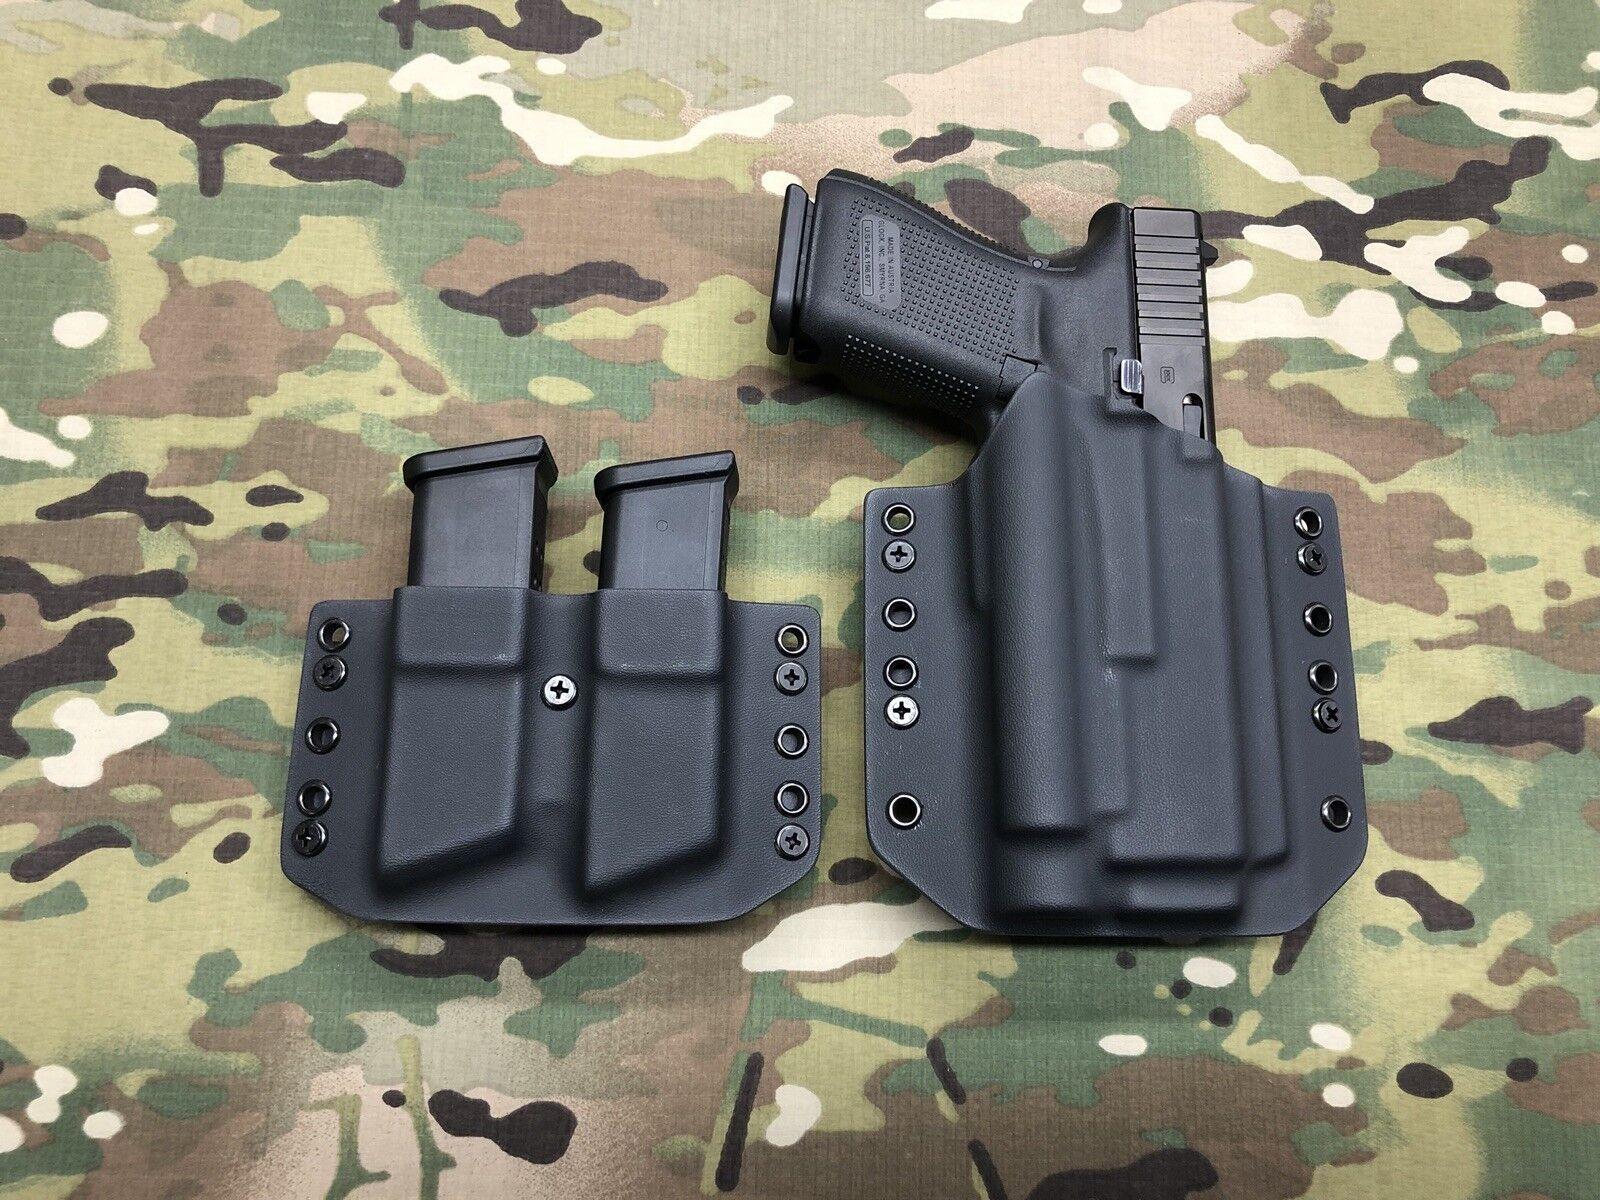 Negro Funda De Kydex Glock 19 23 Olight PL-2 Valkyrie & Doble Mag portador